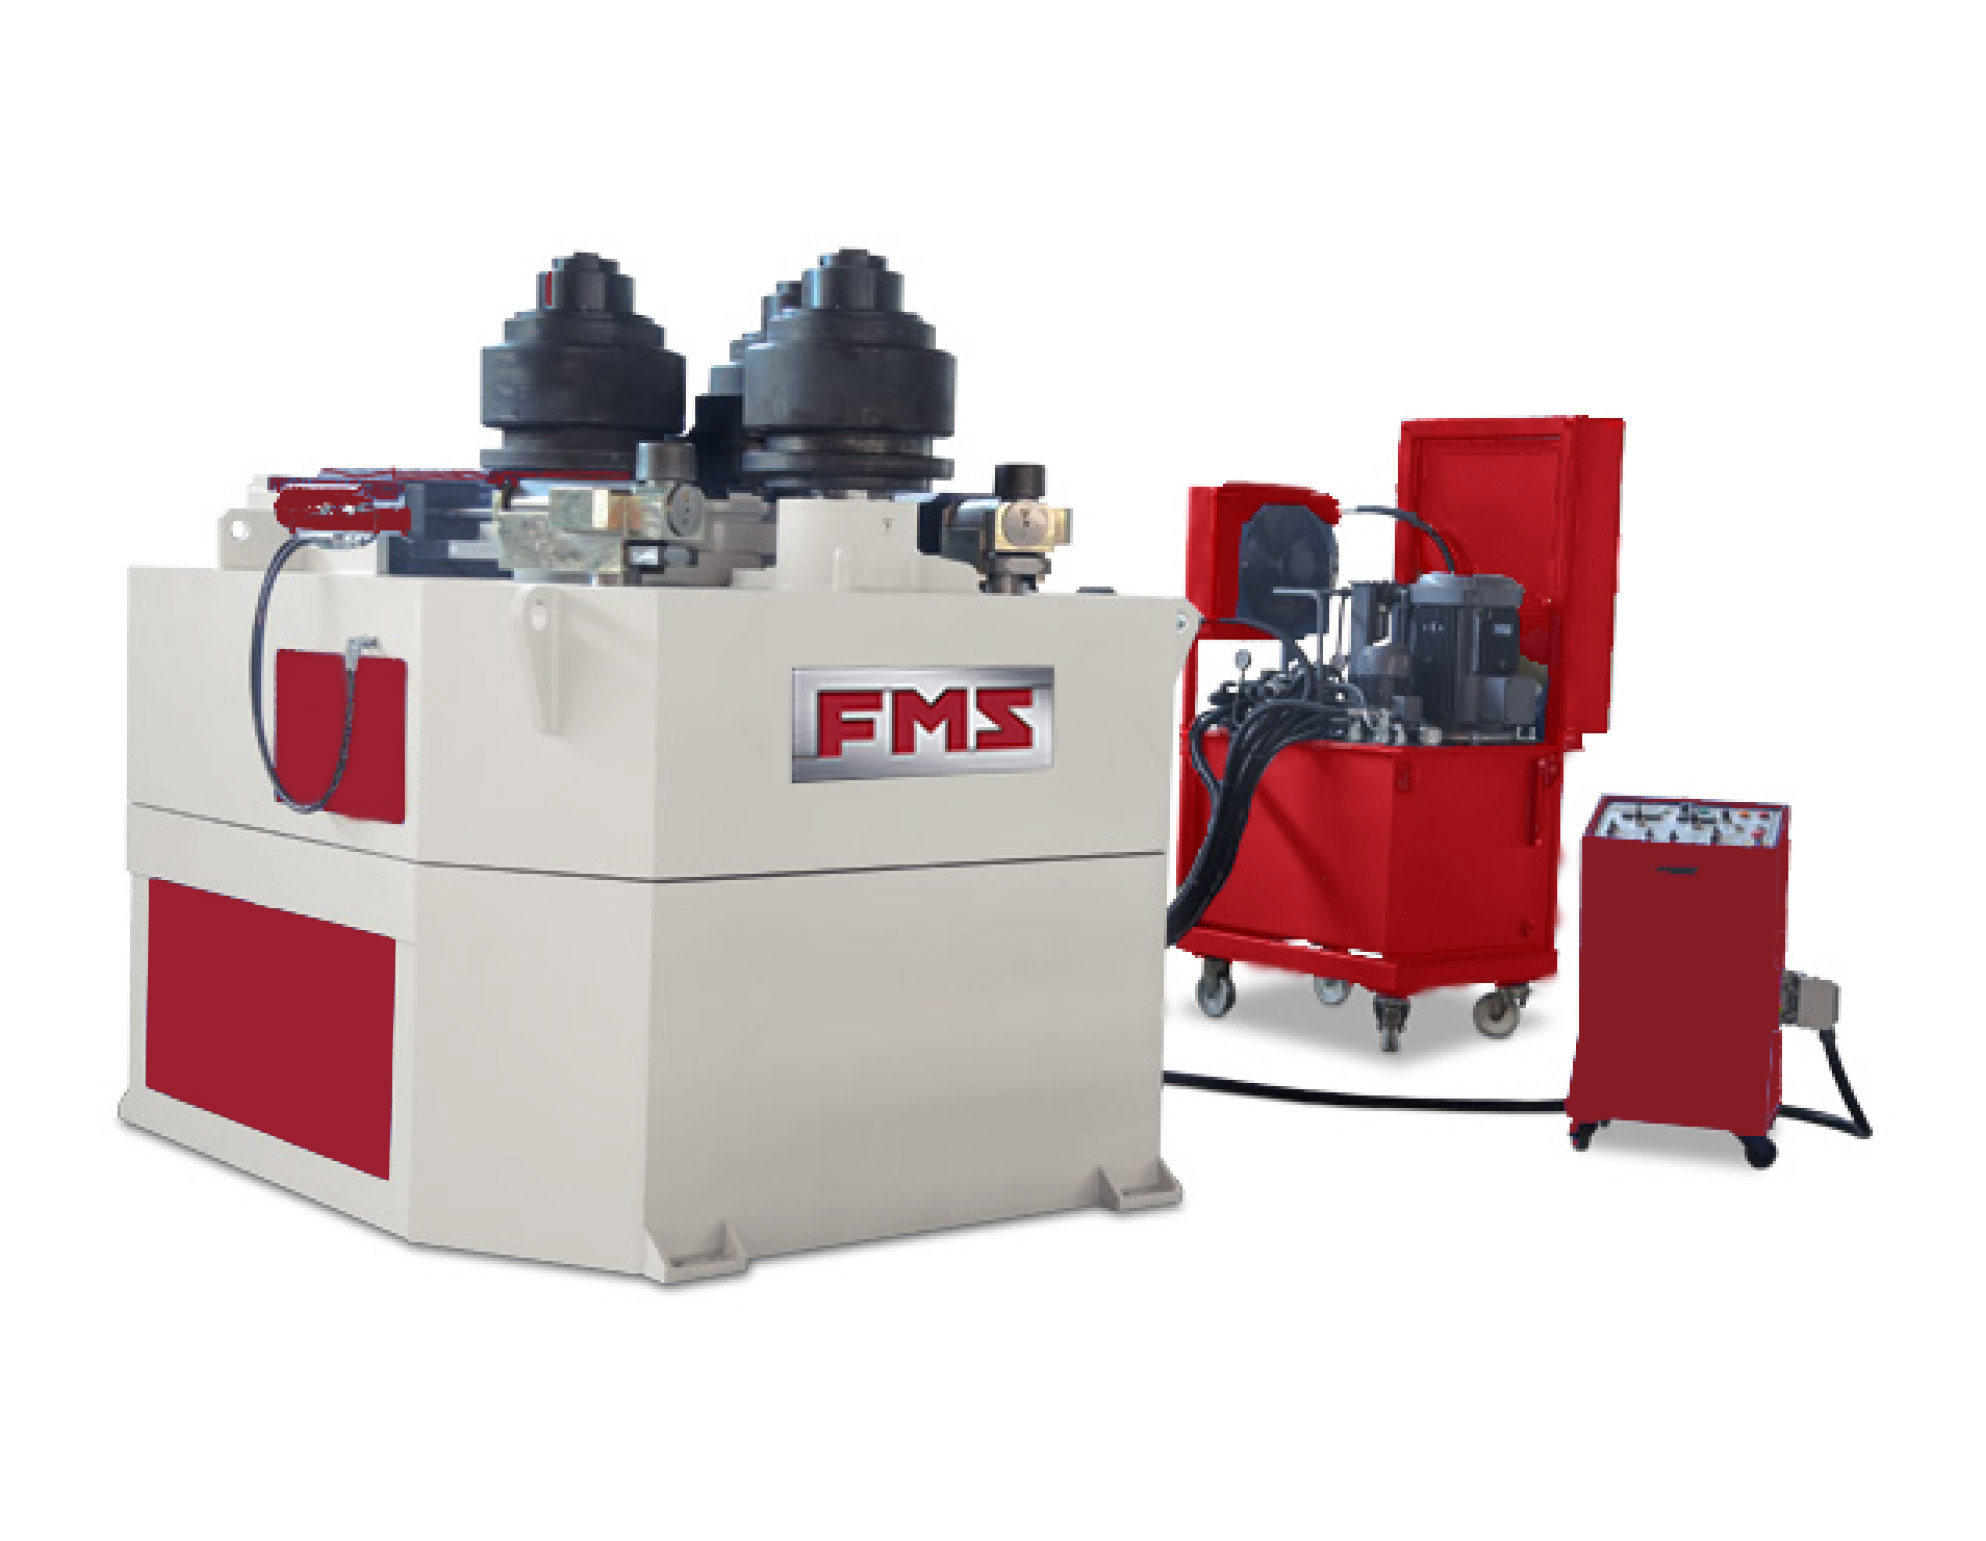 FMS 170 HYDRAULIC PROFILE BENDING MACHINE